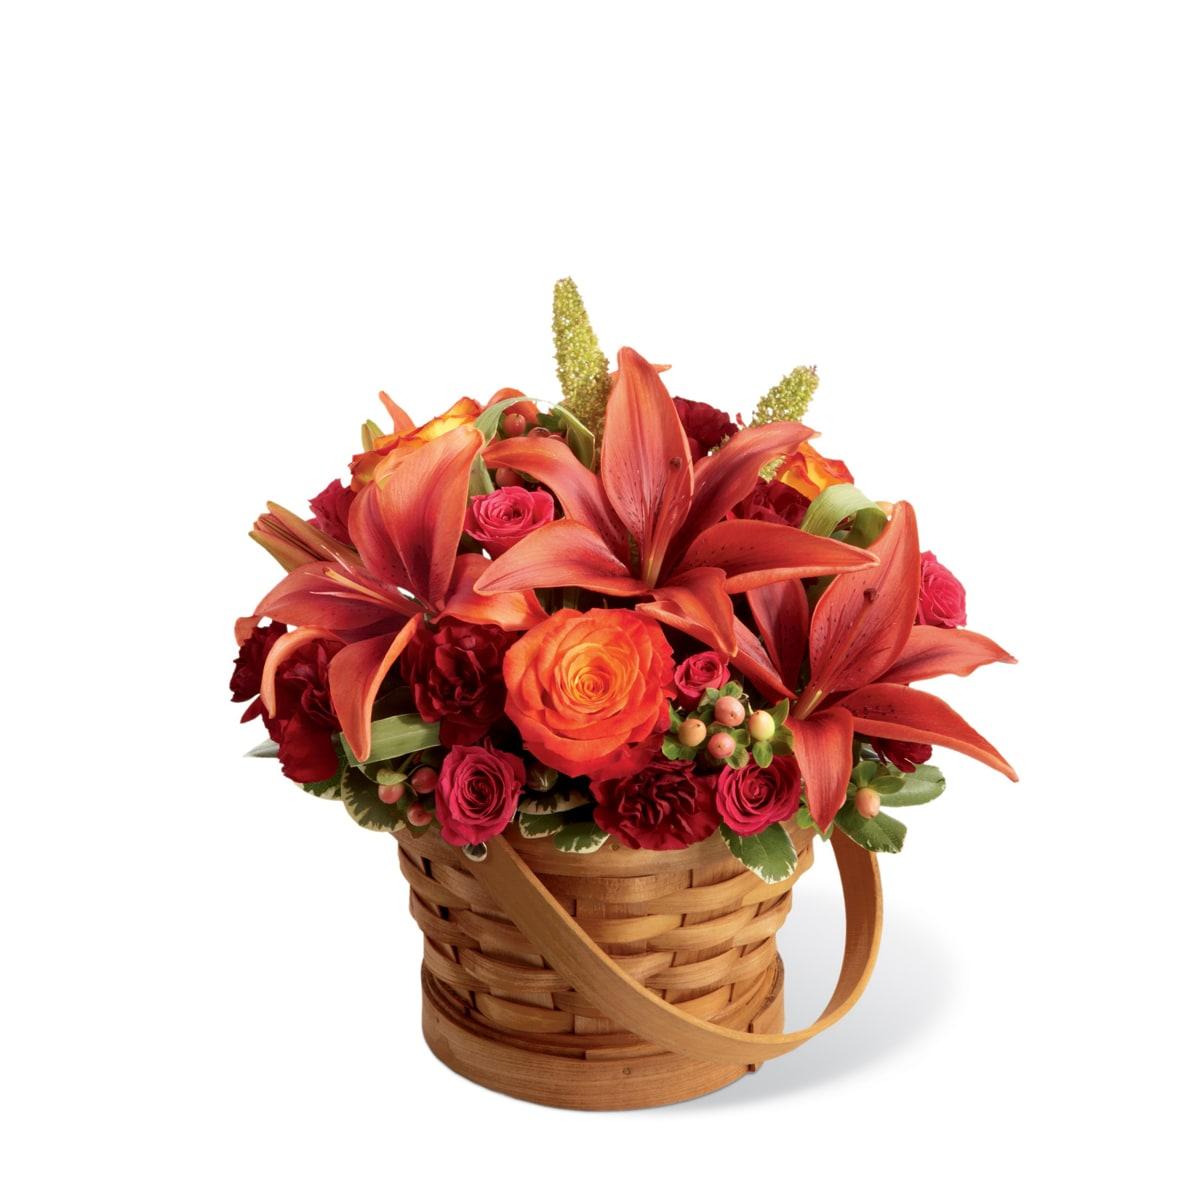 The FTD® Abundant Harvest™ Basket with Lilies